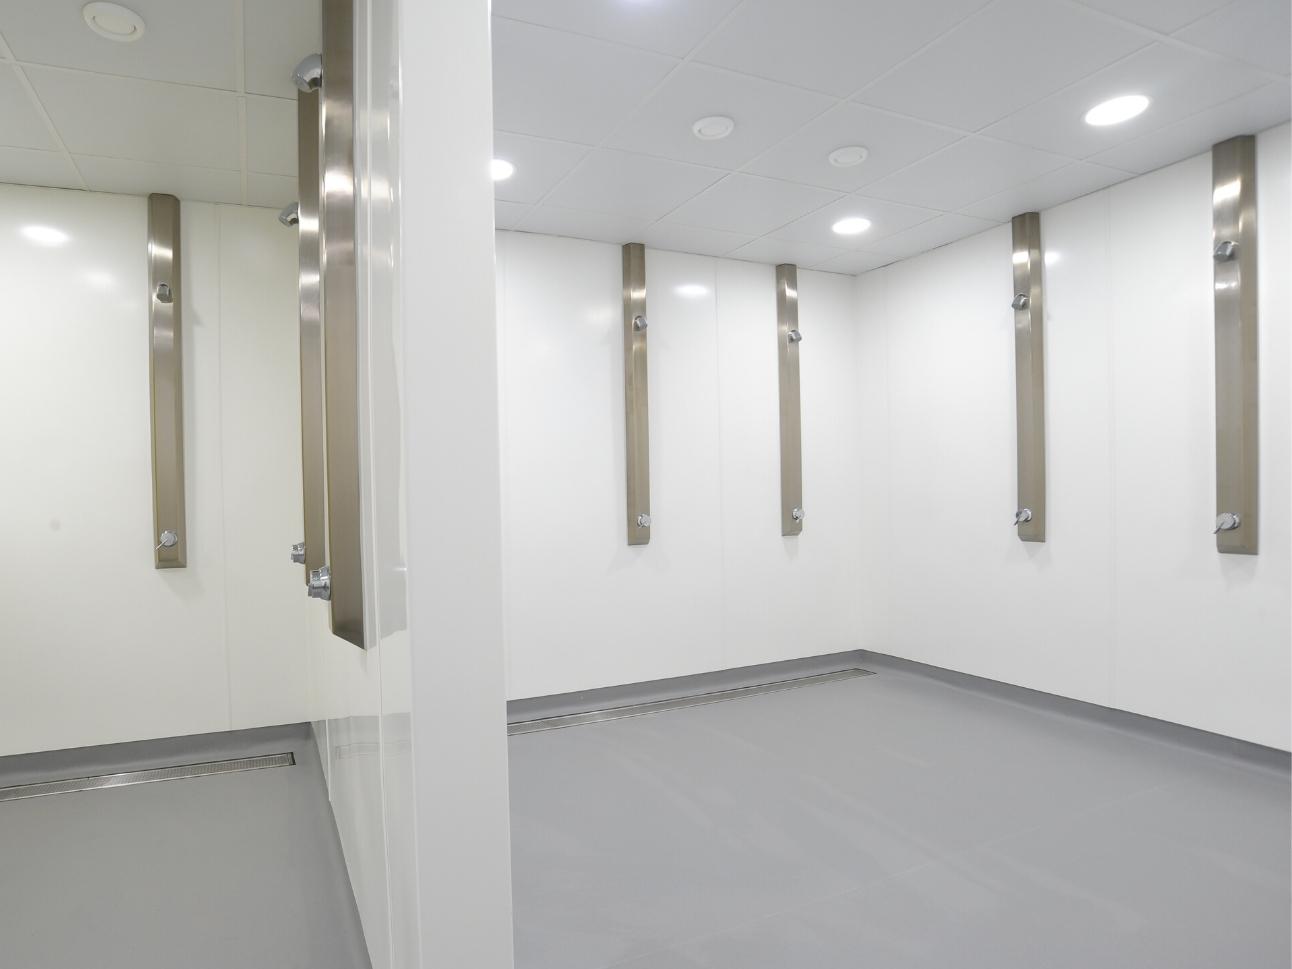 Hampton School Shower Room Refubishment | Case Study | Commercial Washrooms